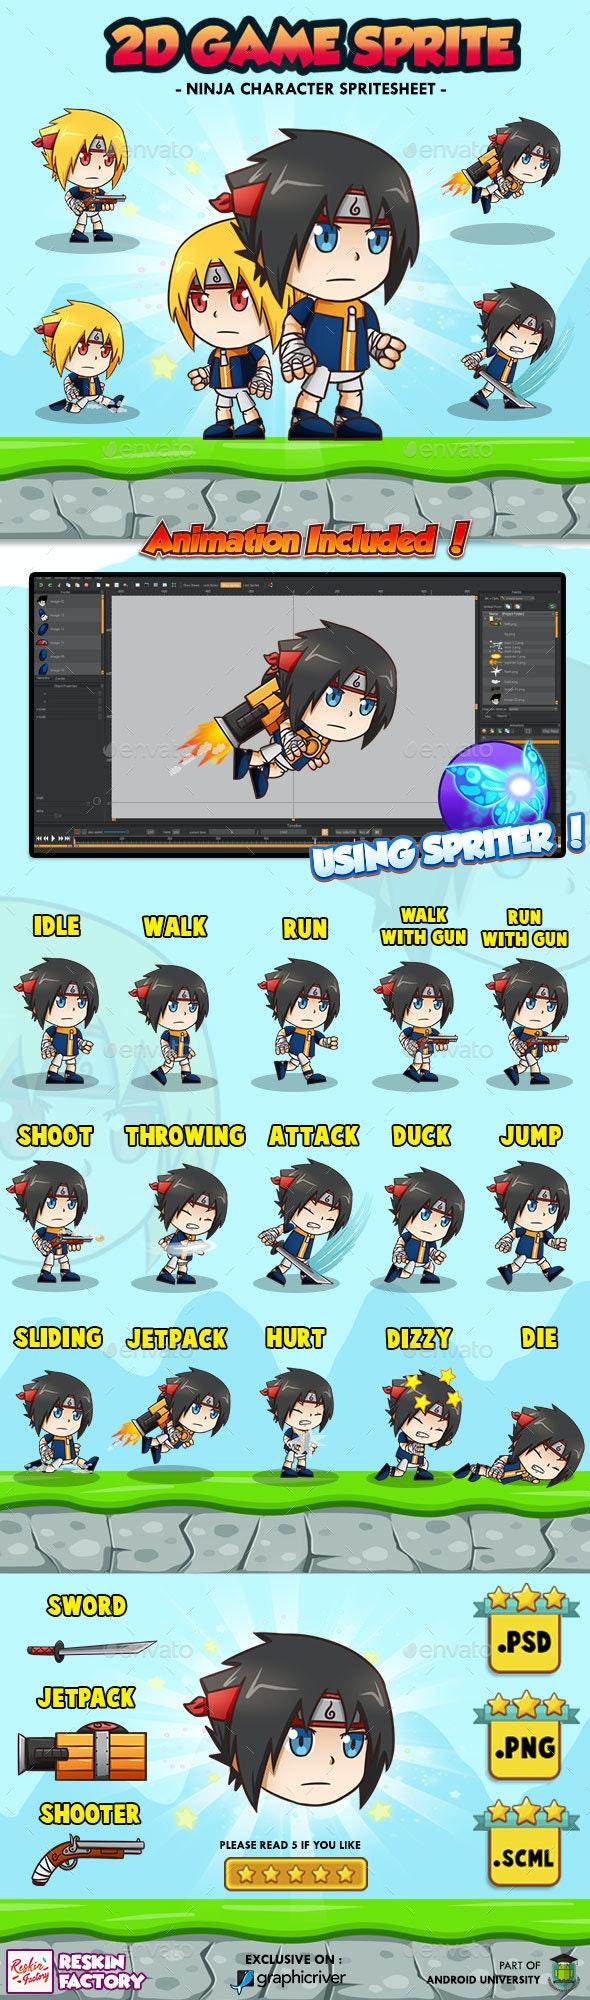 Ninja BeYe - 2D Game Character Sprites - Sprites Game Assets